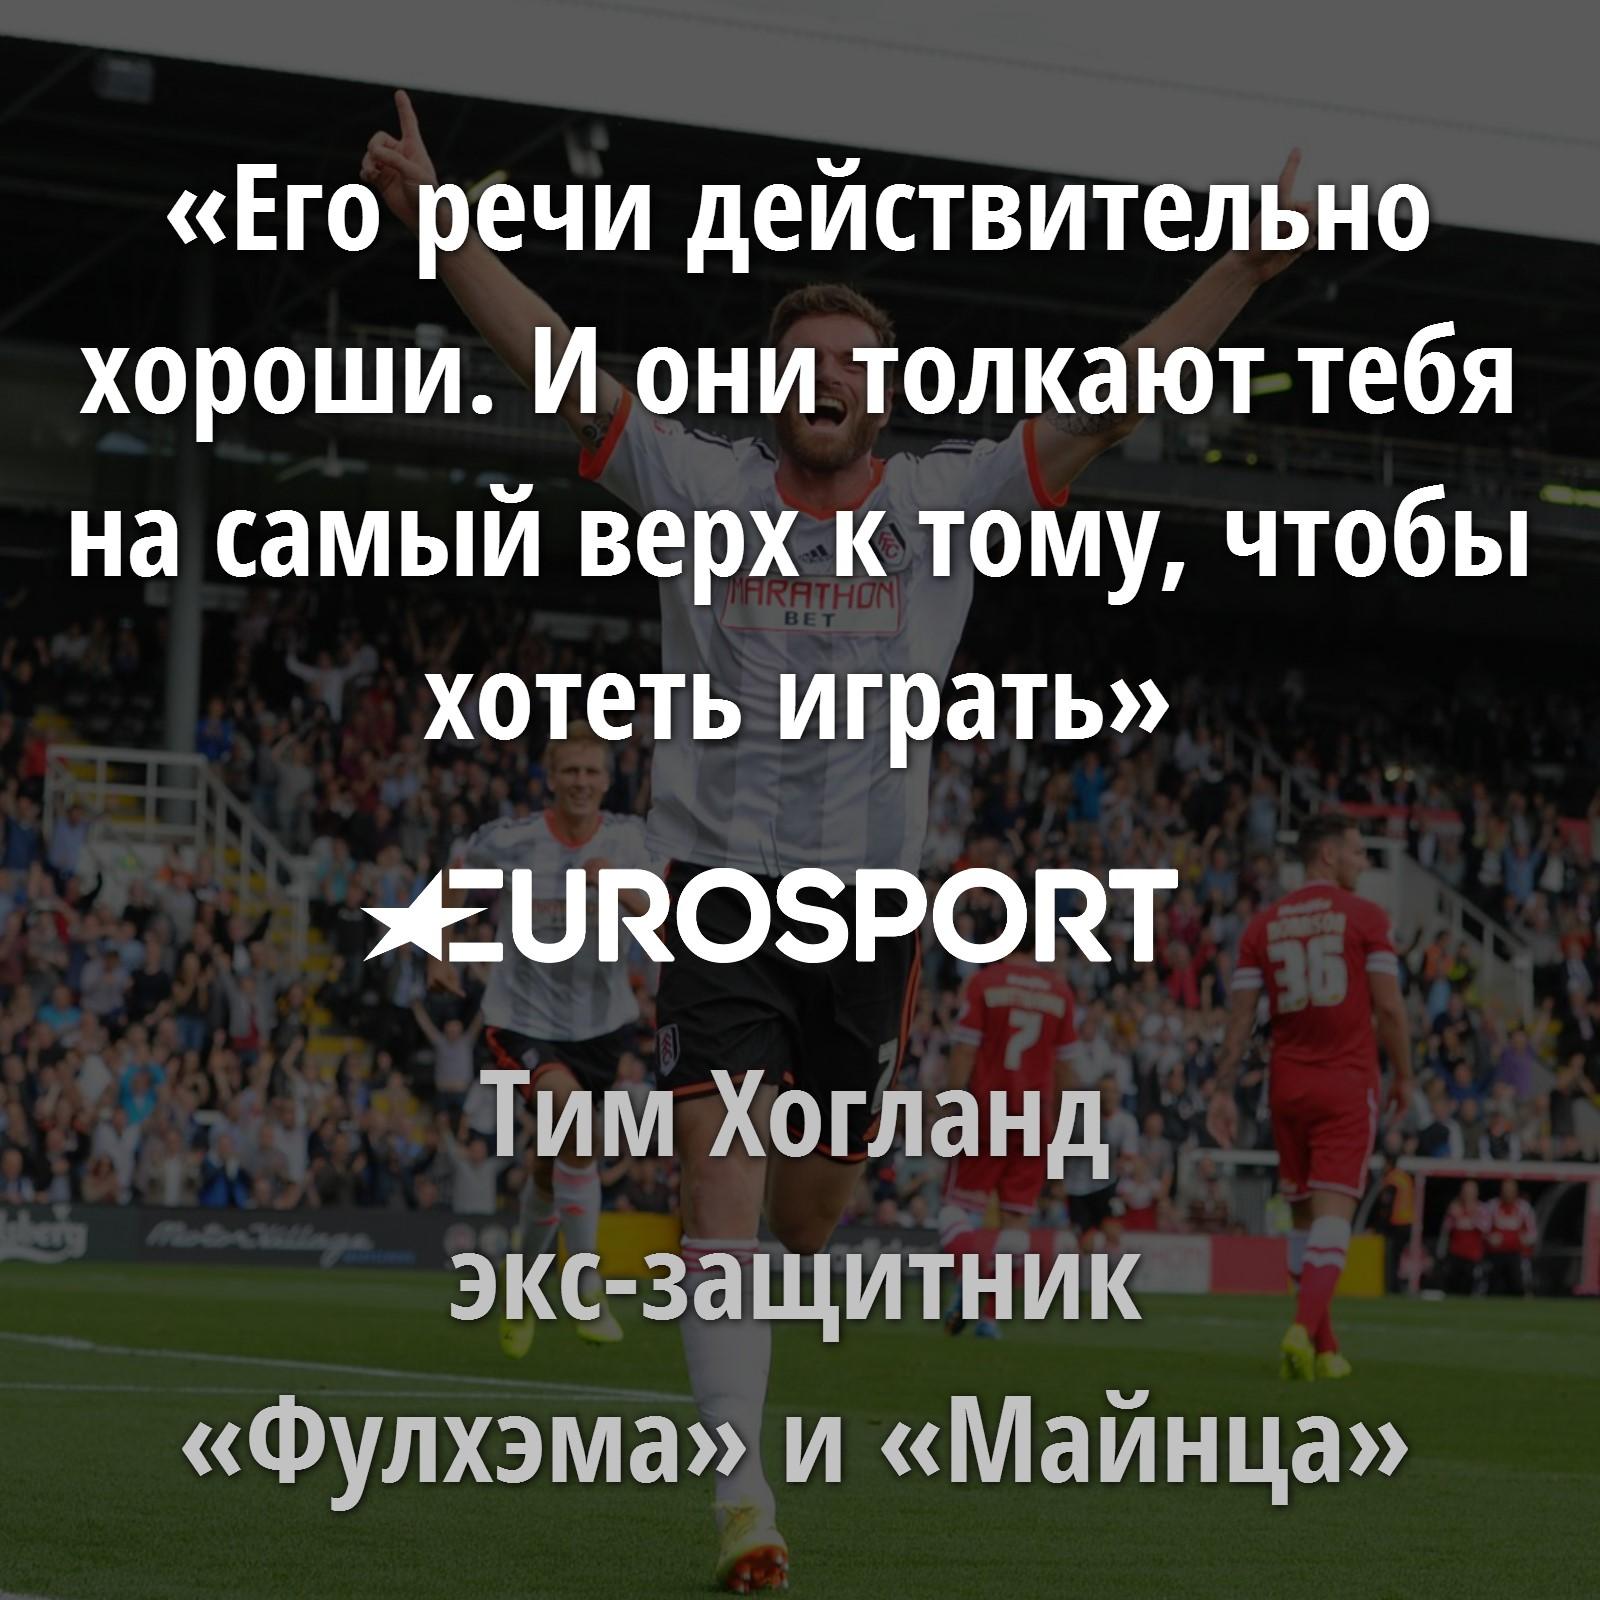 https://i.eurosport.com/2015/11/19/1735226.jpg